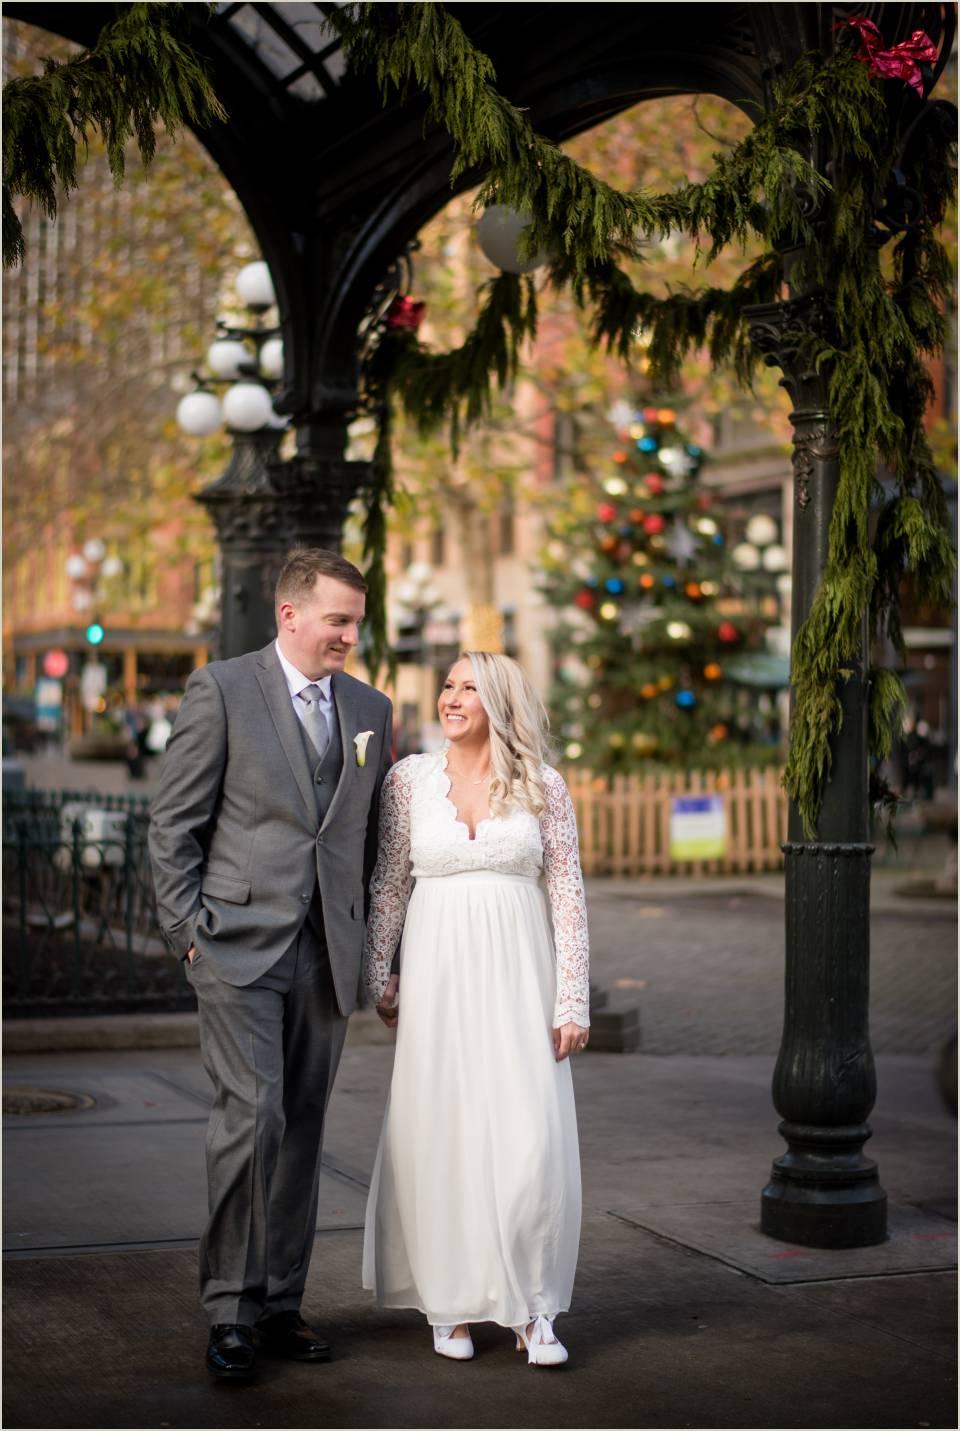 newlywed couple walking christmas wedding photos